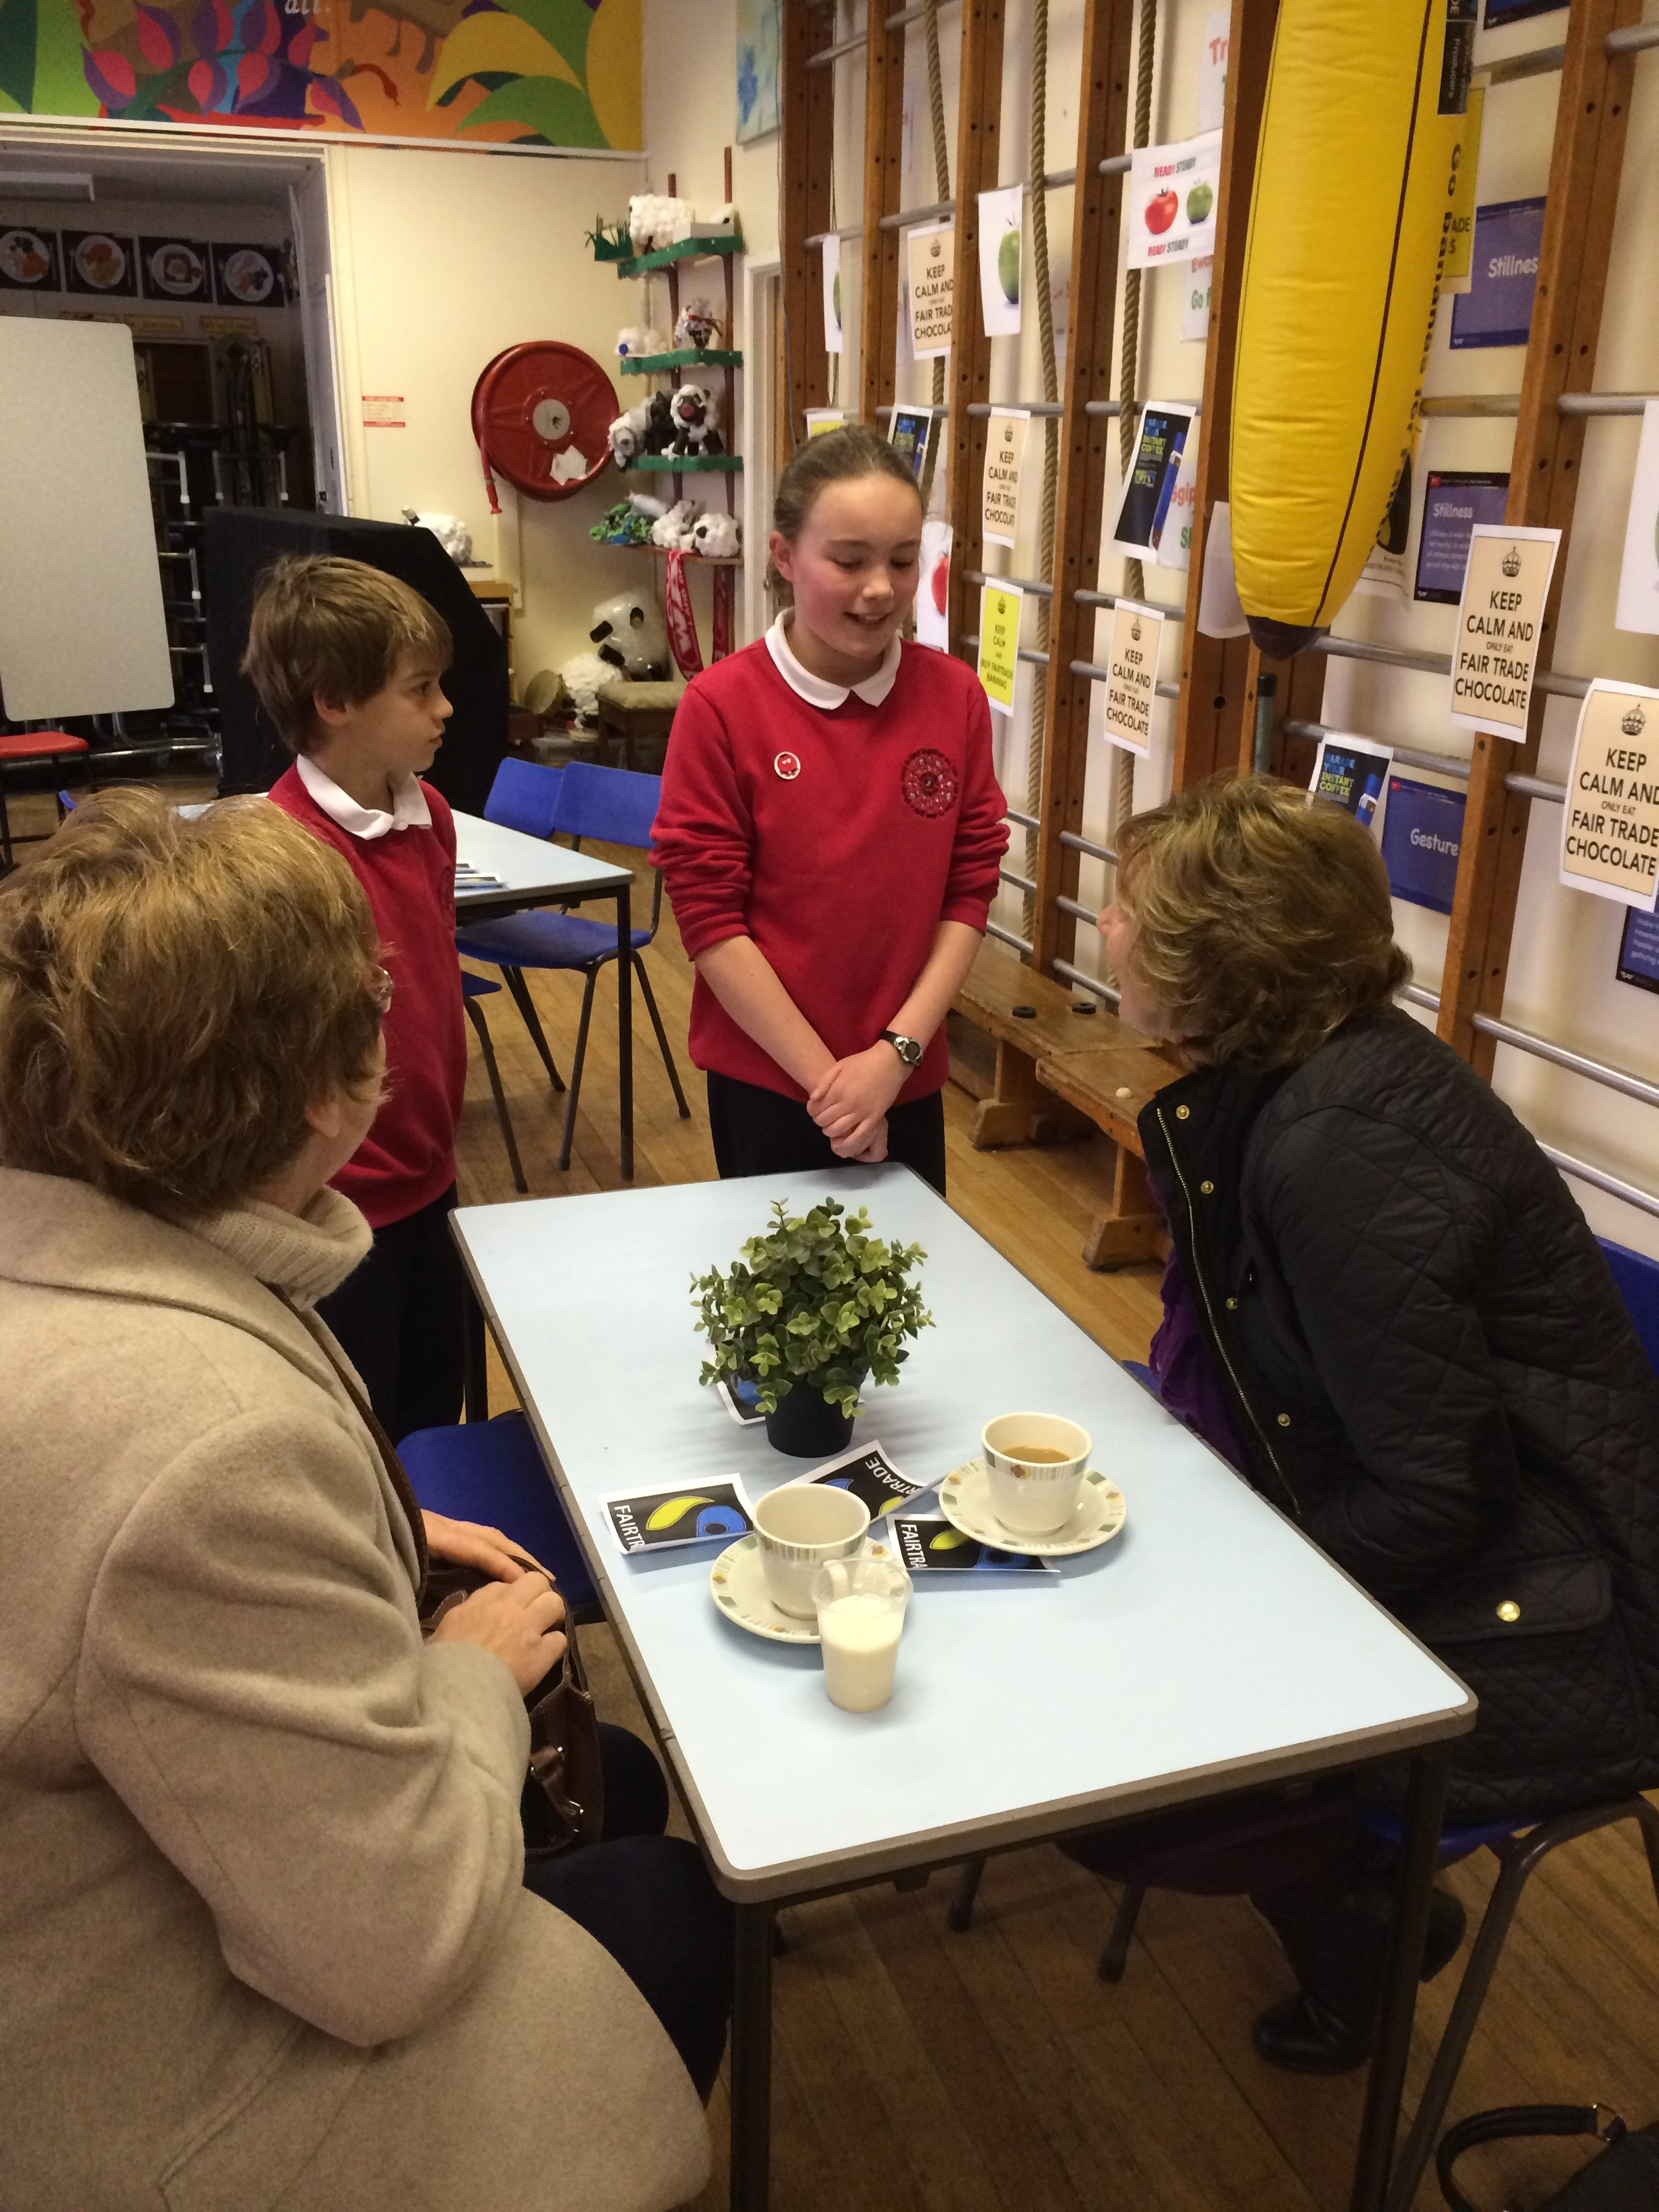 Discussing Fairtrade